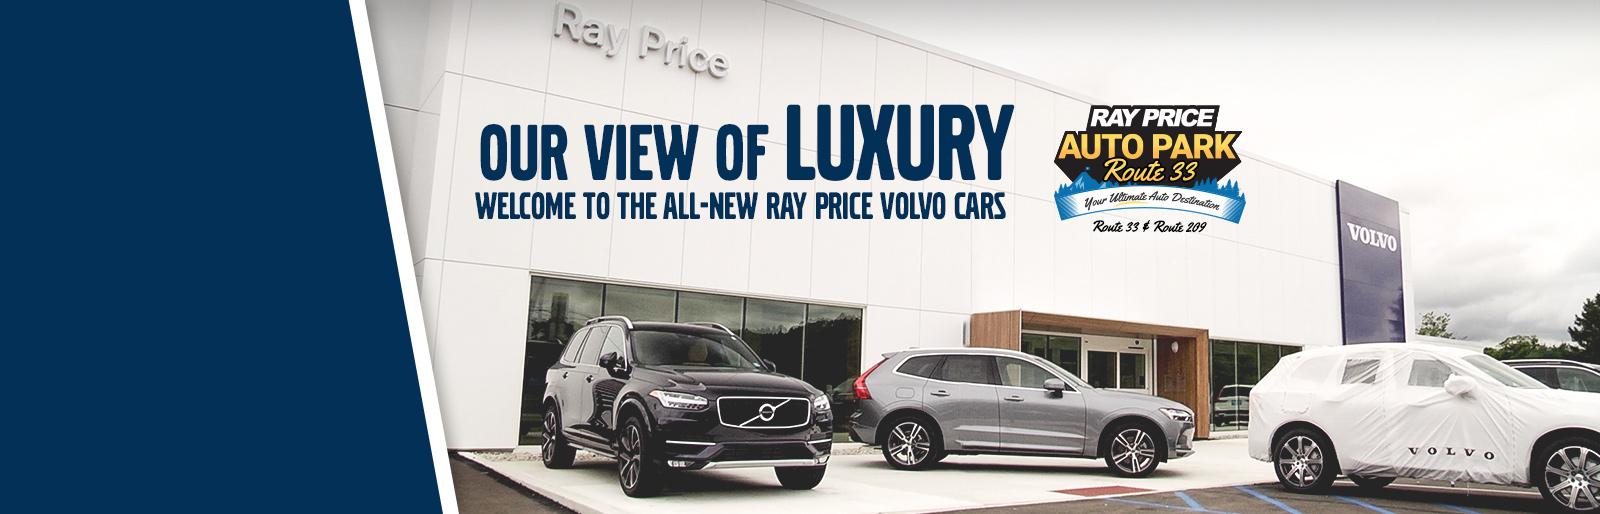 ray price volvo cars